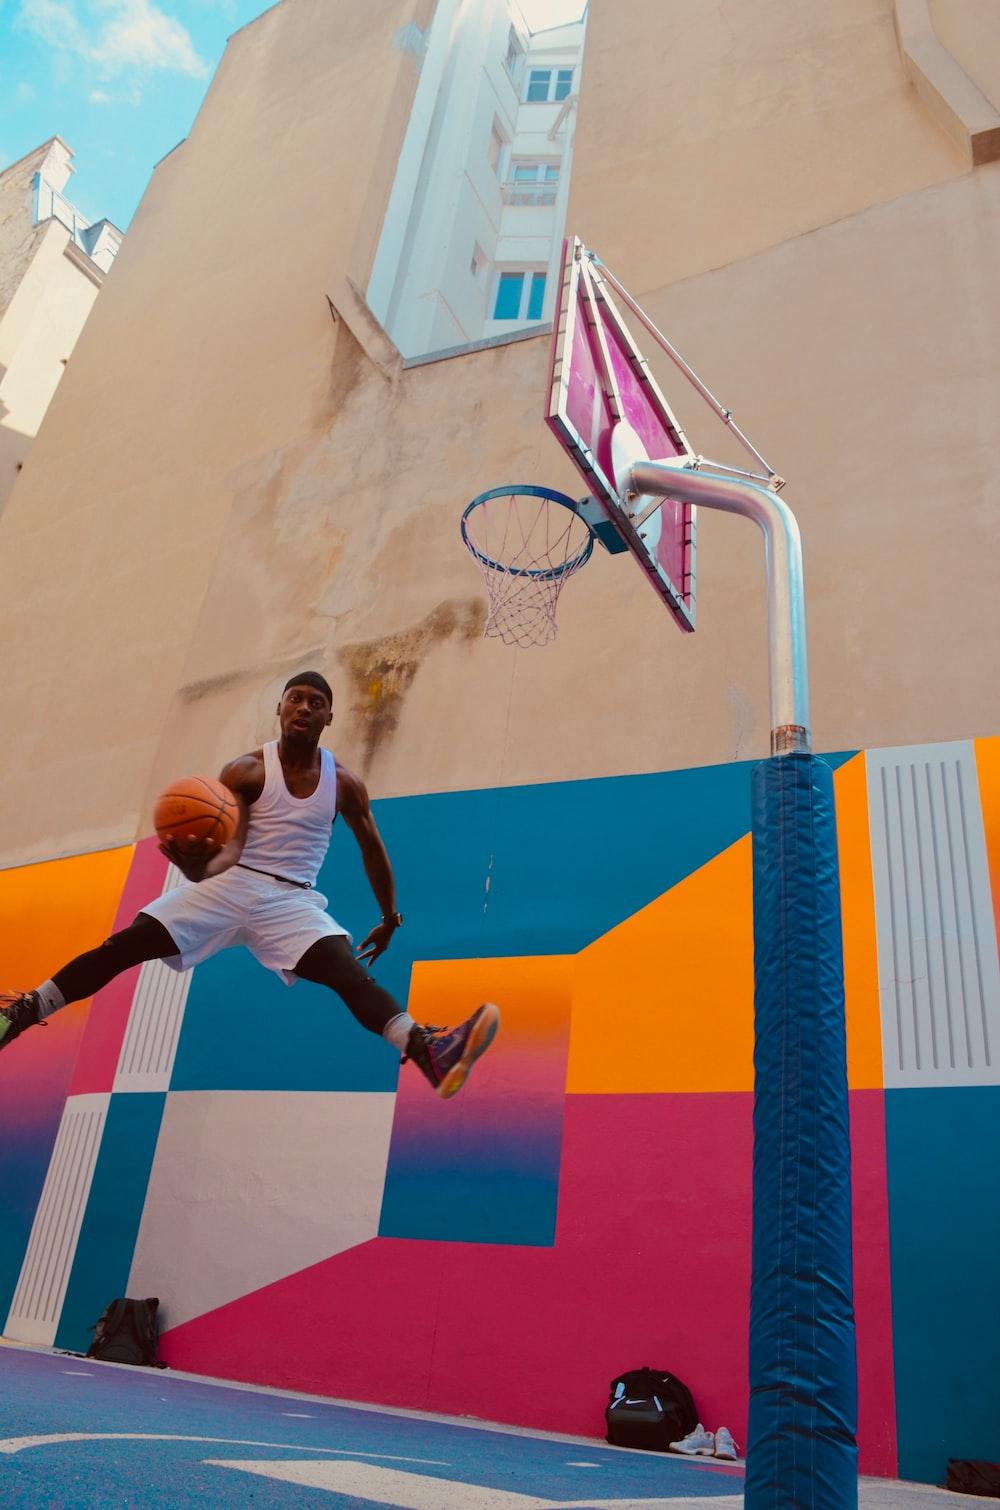 man holding basket ball near concrete building